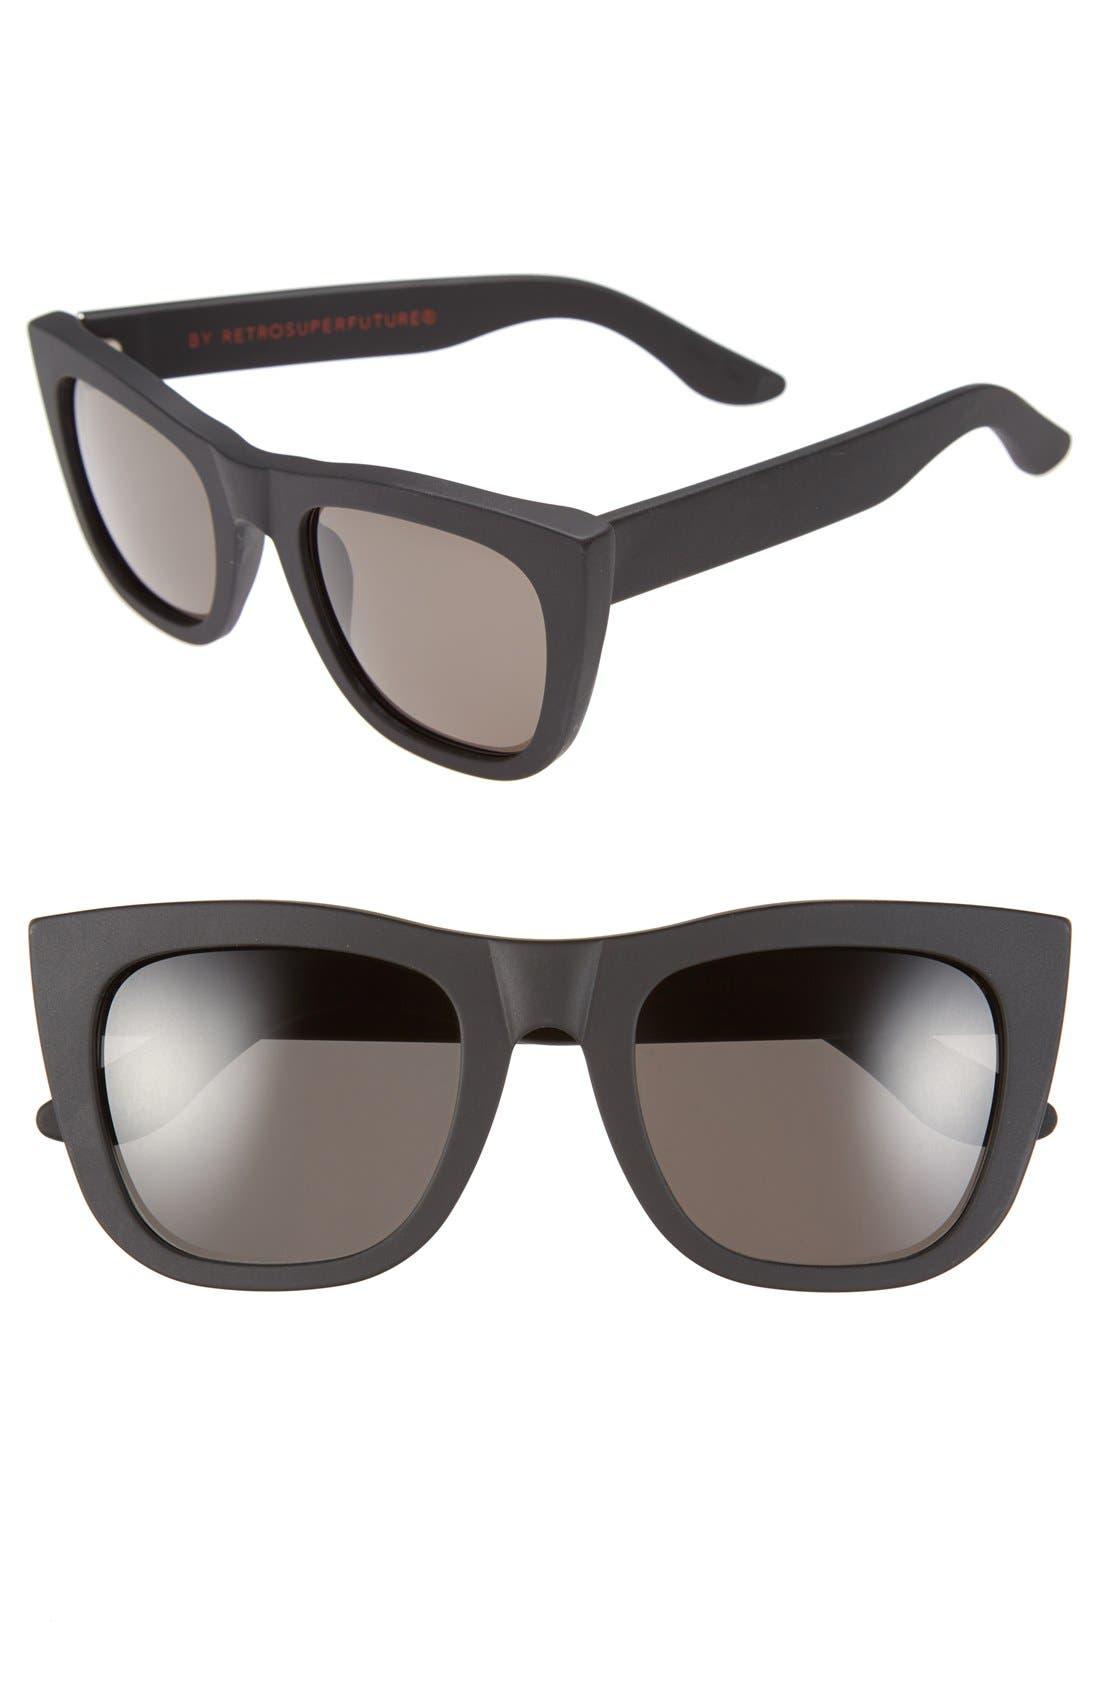 Main Image - SUPER by RETROSUPERFUTURE® 'Gals' 50mm Retro Sunglasses